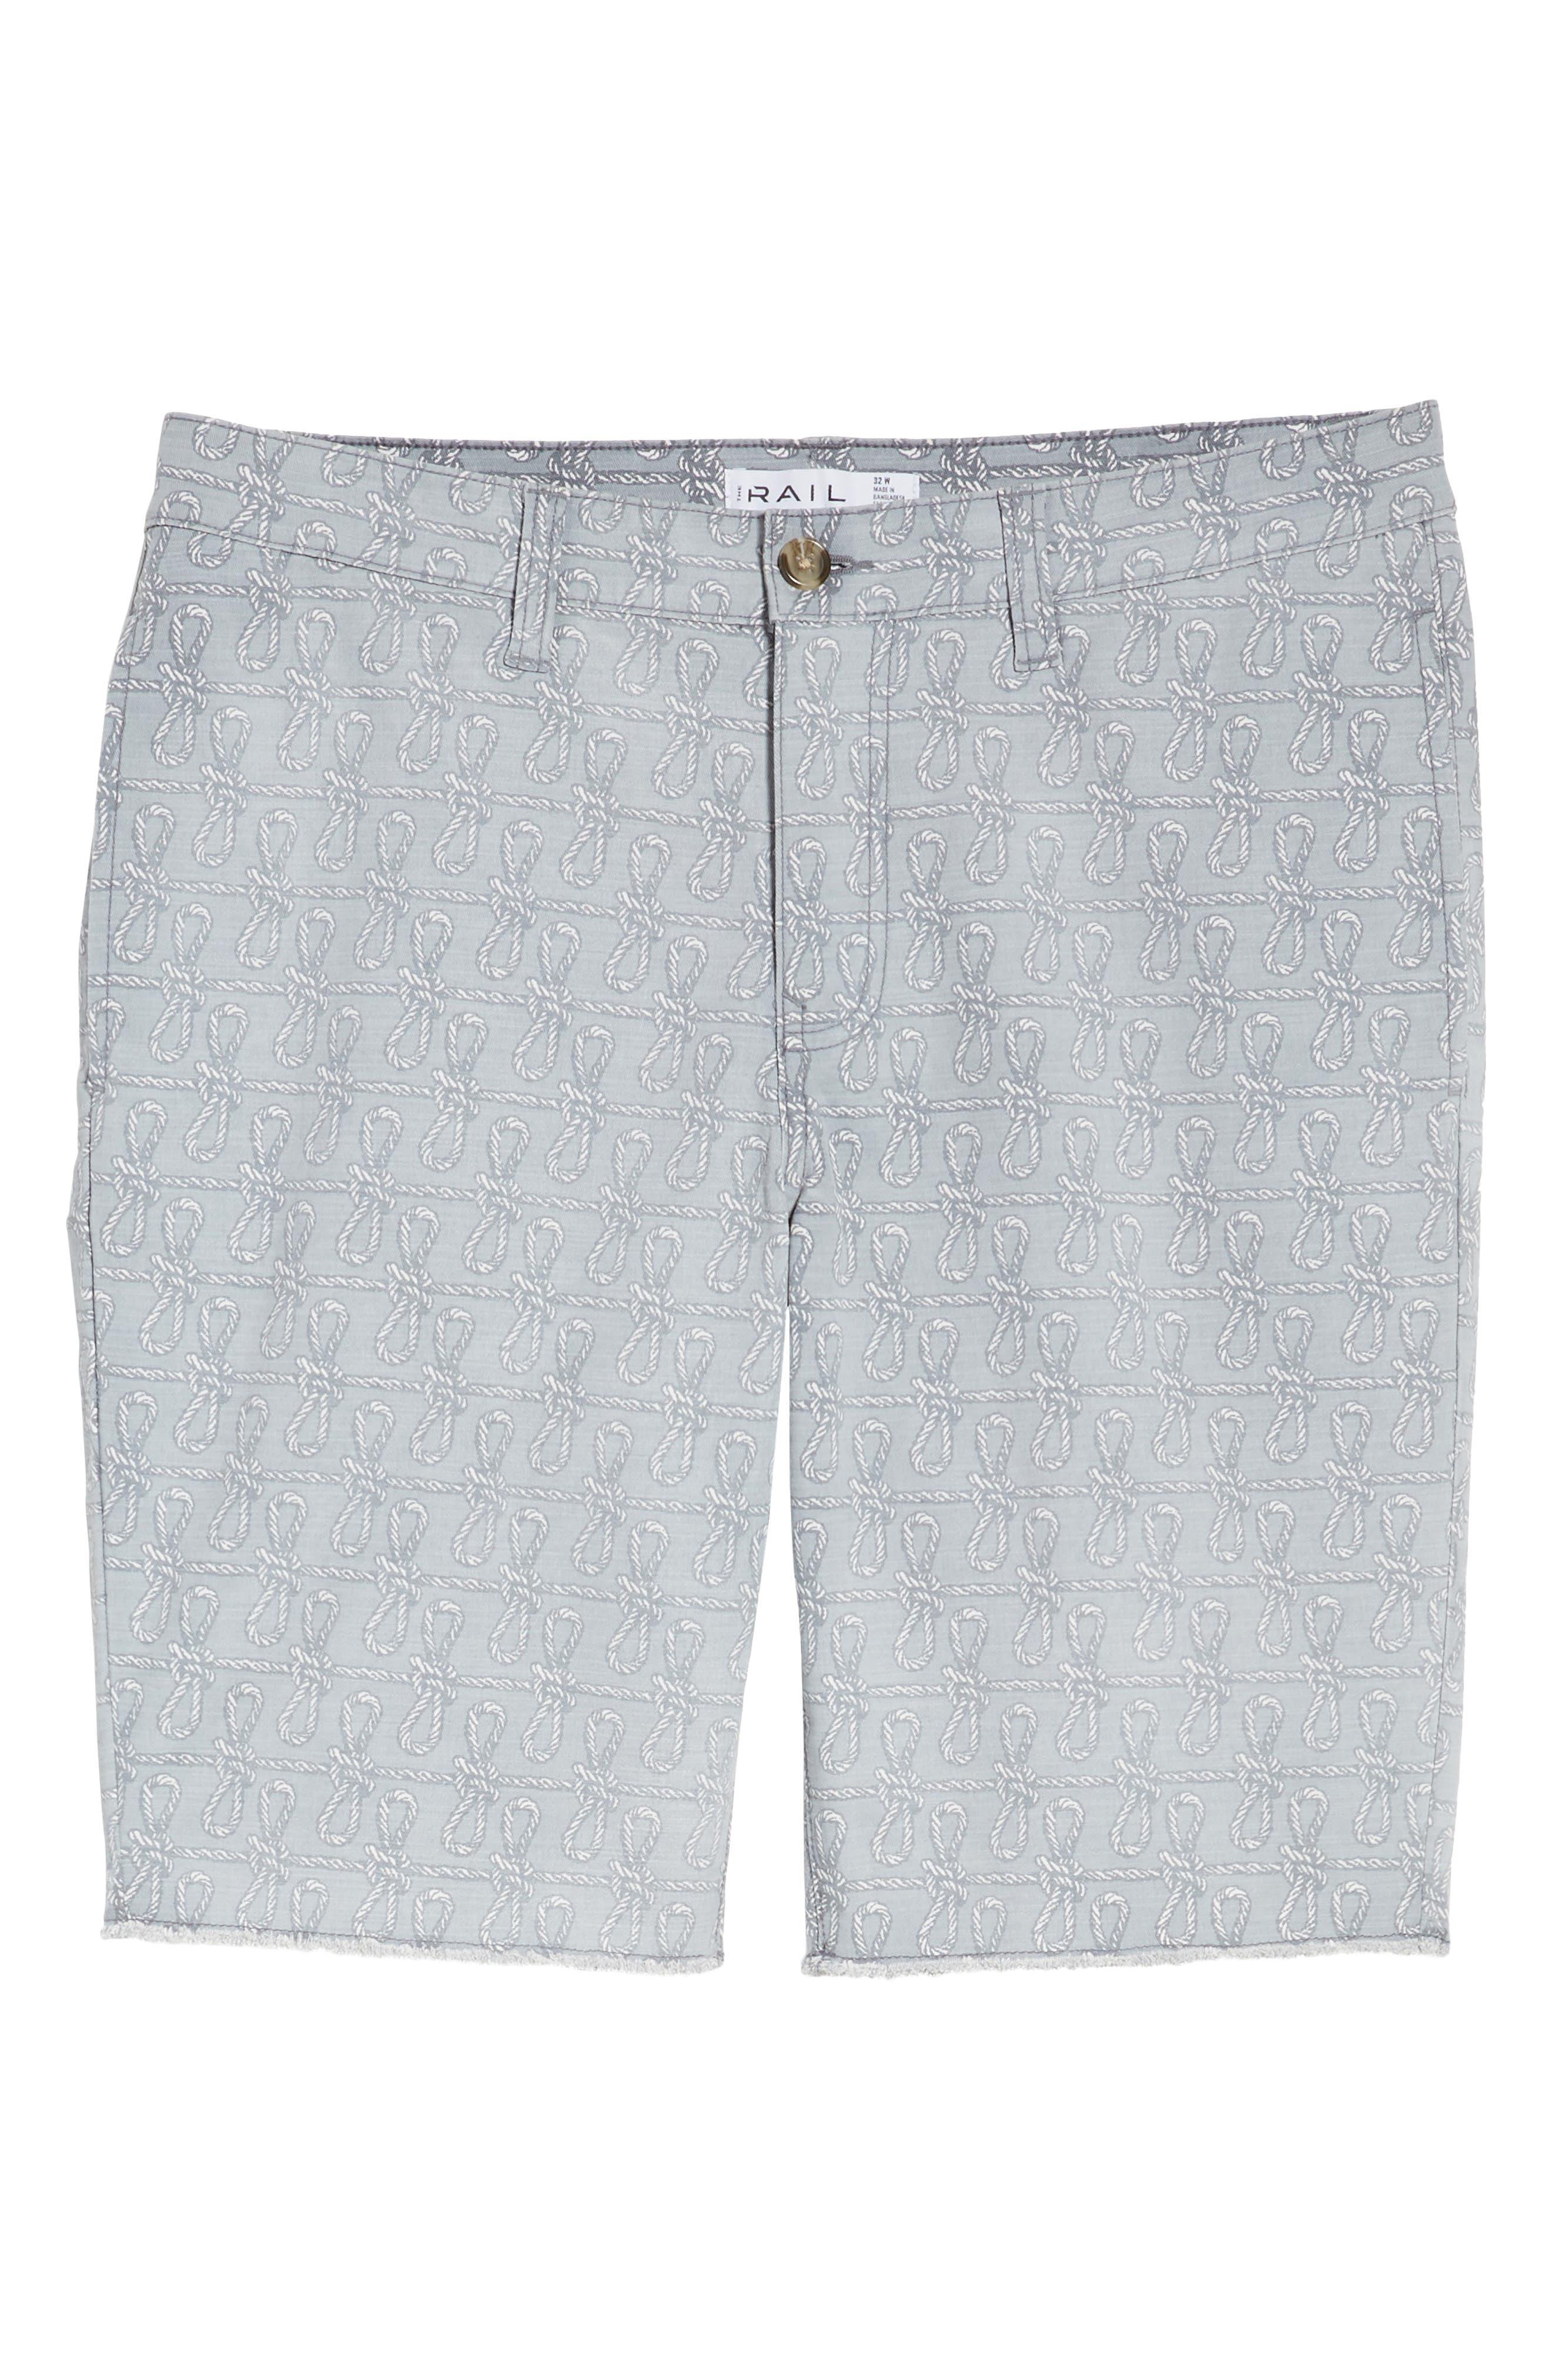 Print Frost Wash Shorts,                             Alternate thumbnail 6, color,                             Grey Rope Print